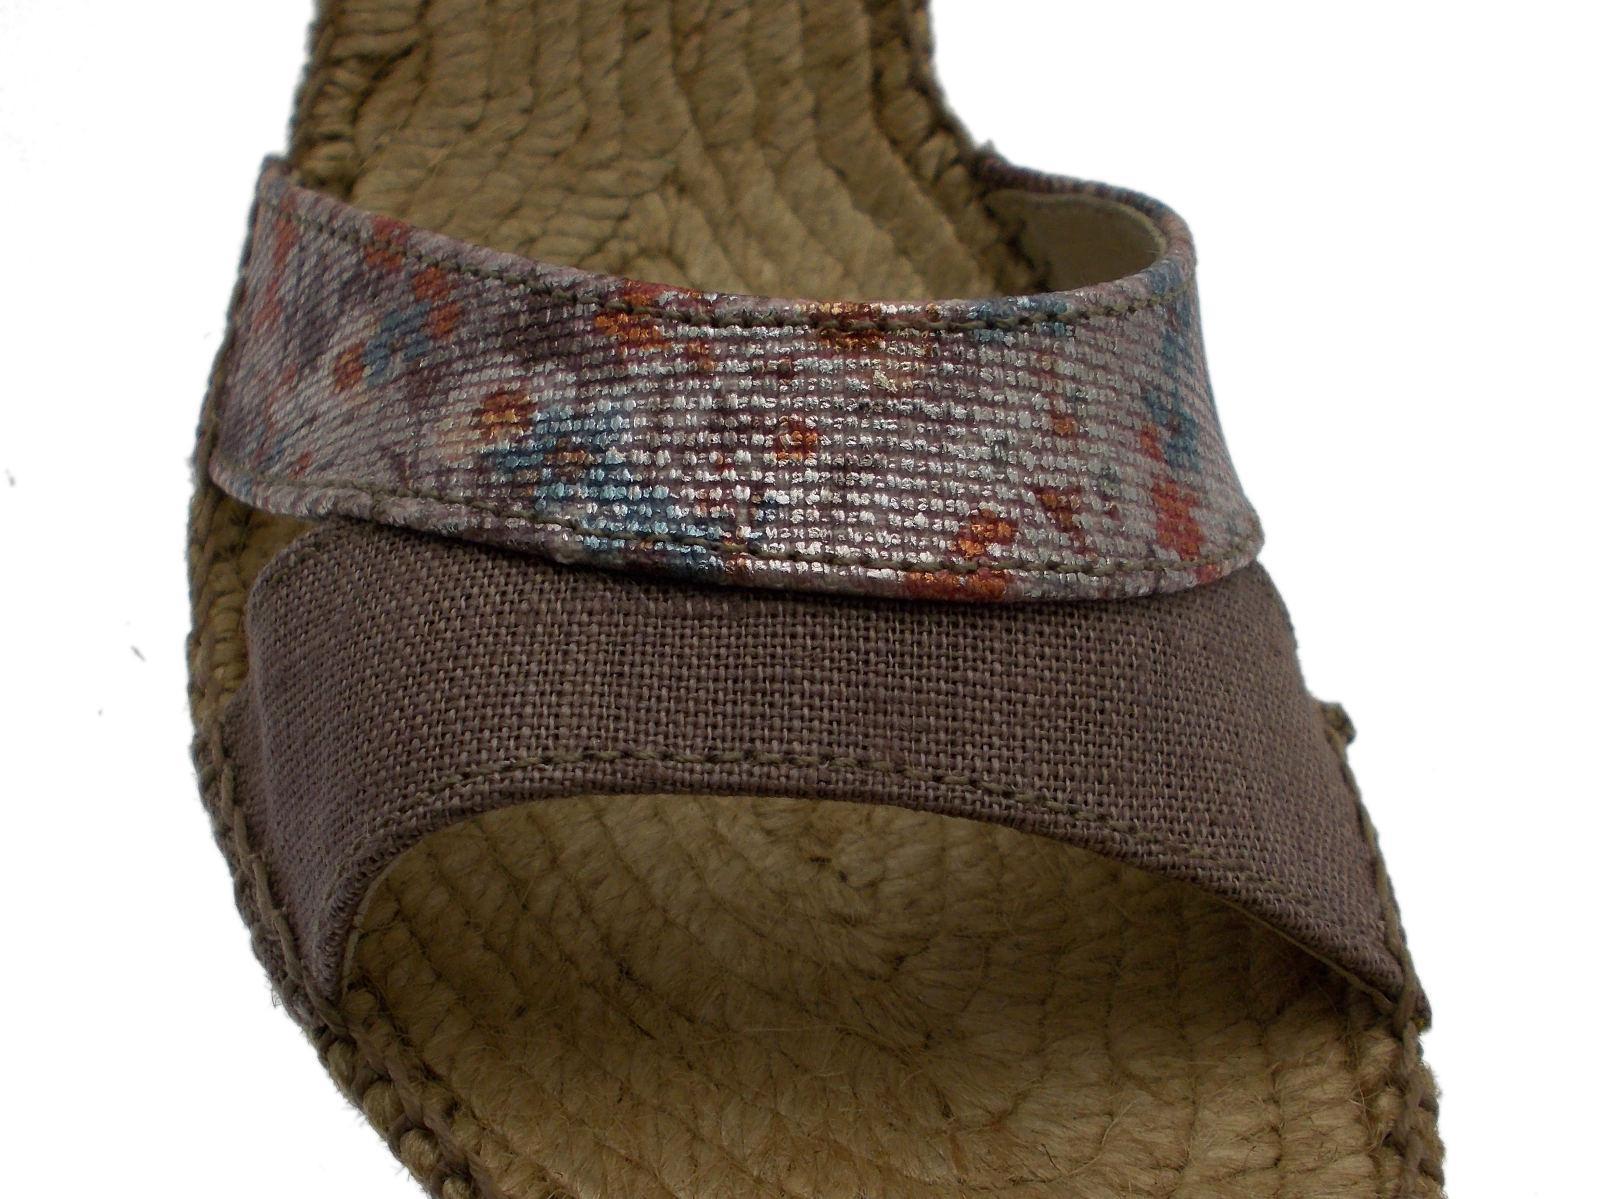 Open Sandale rope taupe Toni taupe wedge Article DORIS Toni taupe Pons 8fe36f